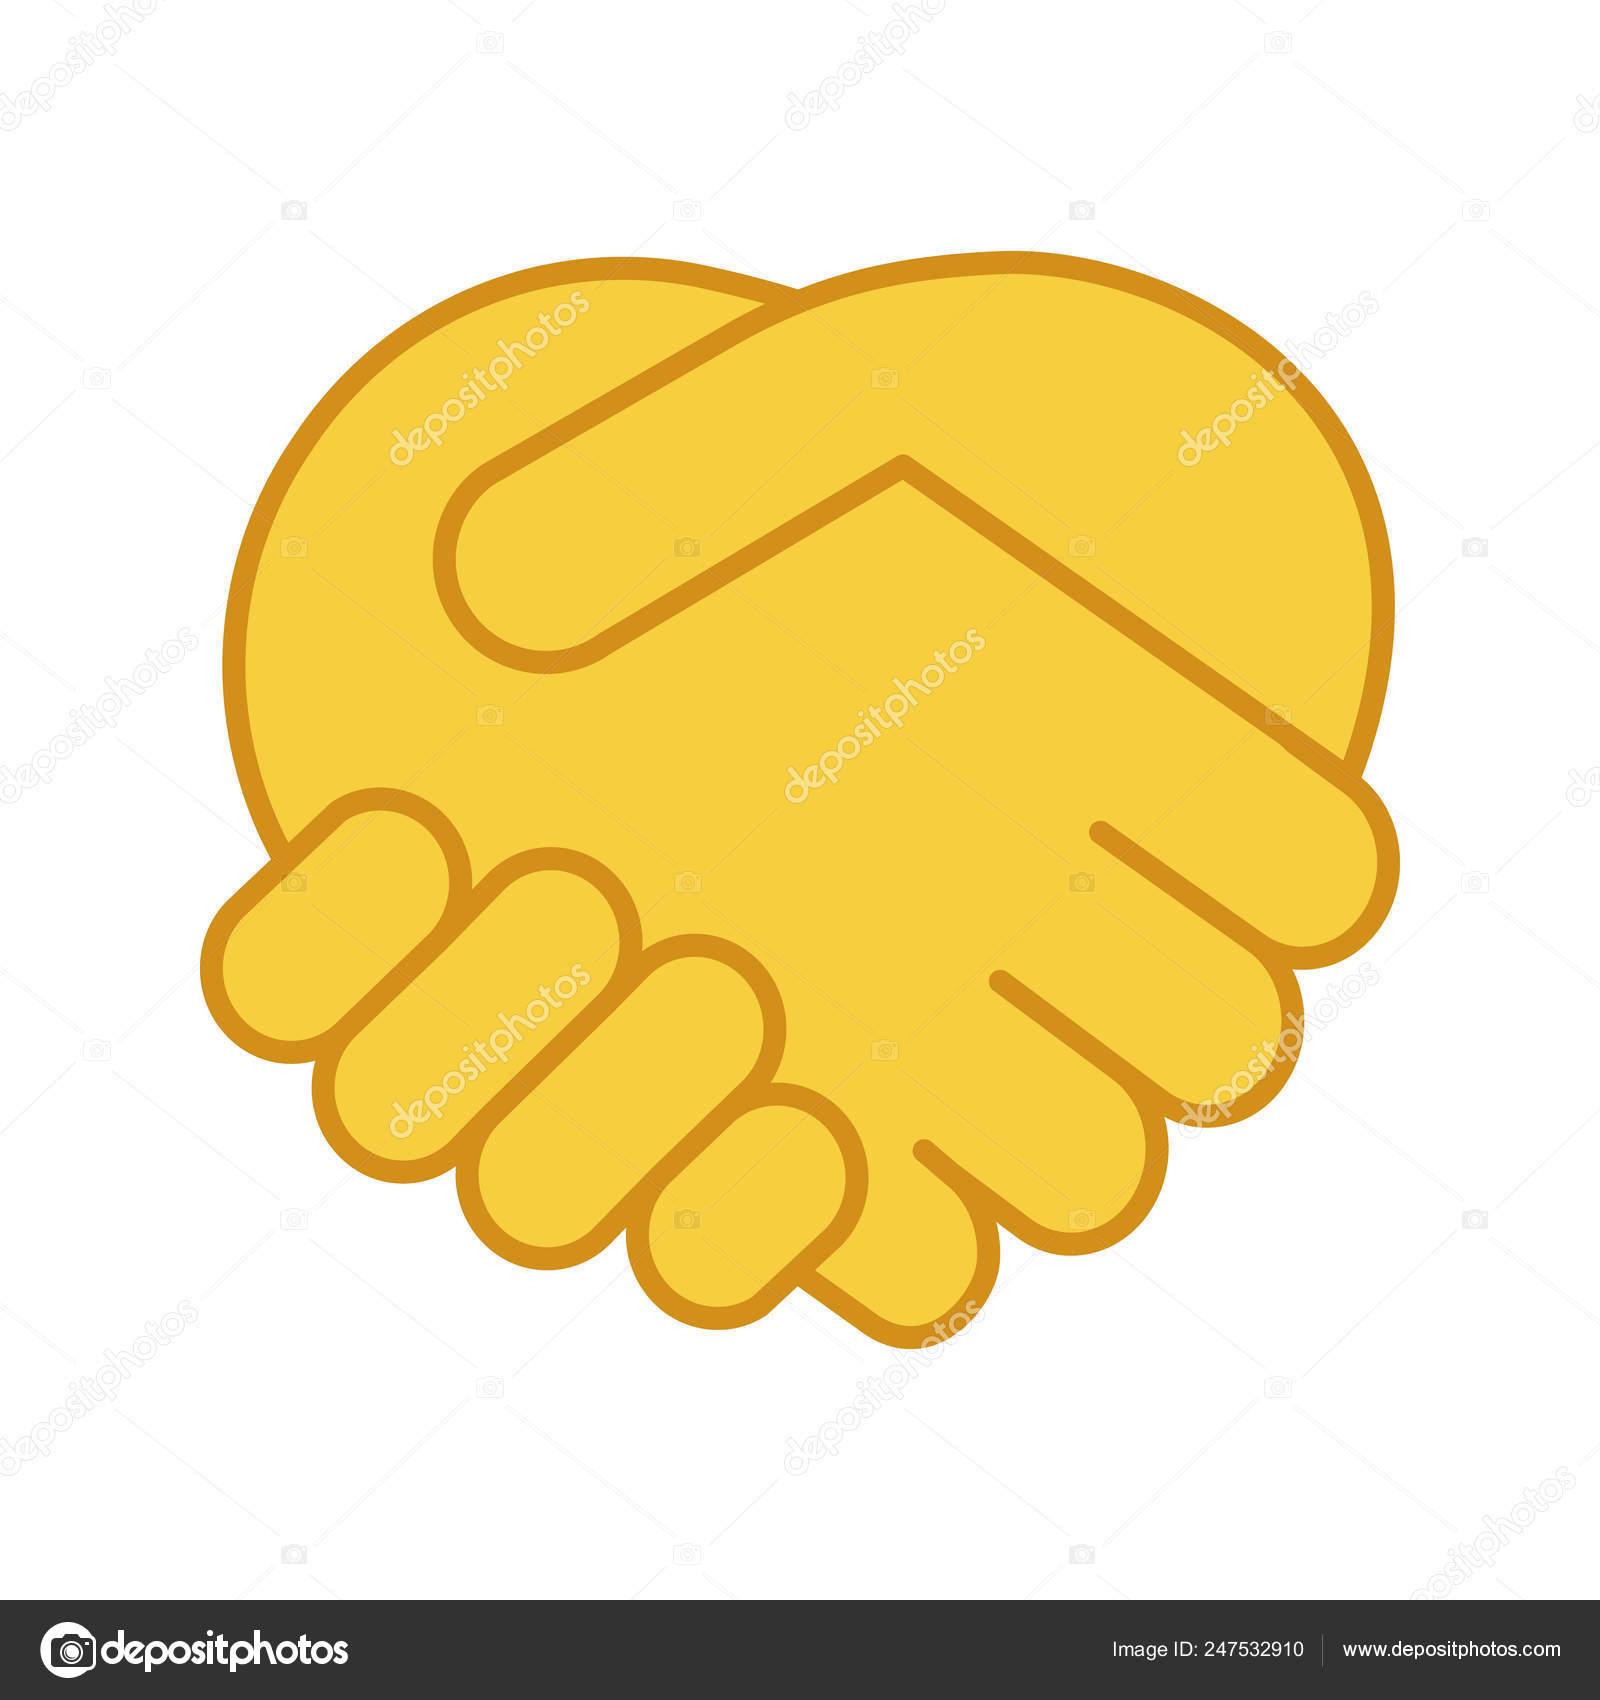 Handshake Gesture Color Icon Shaking Hands Emoji Friends Meeting Agreement  ⬇ Vector Image by © bsd | Vector Stock 247532910